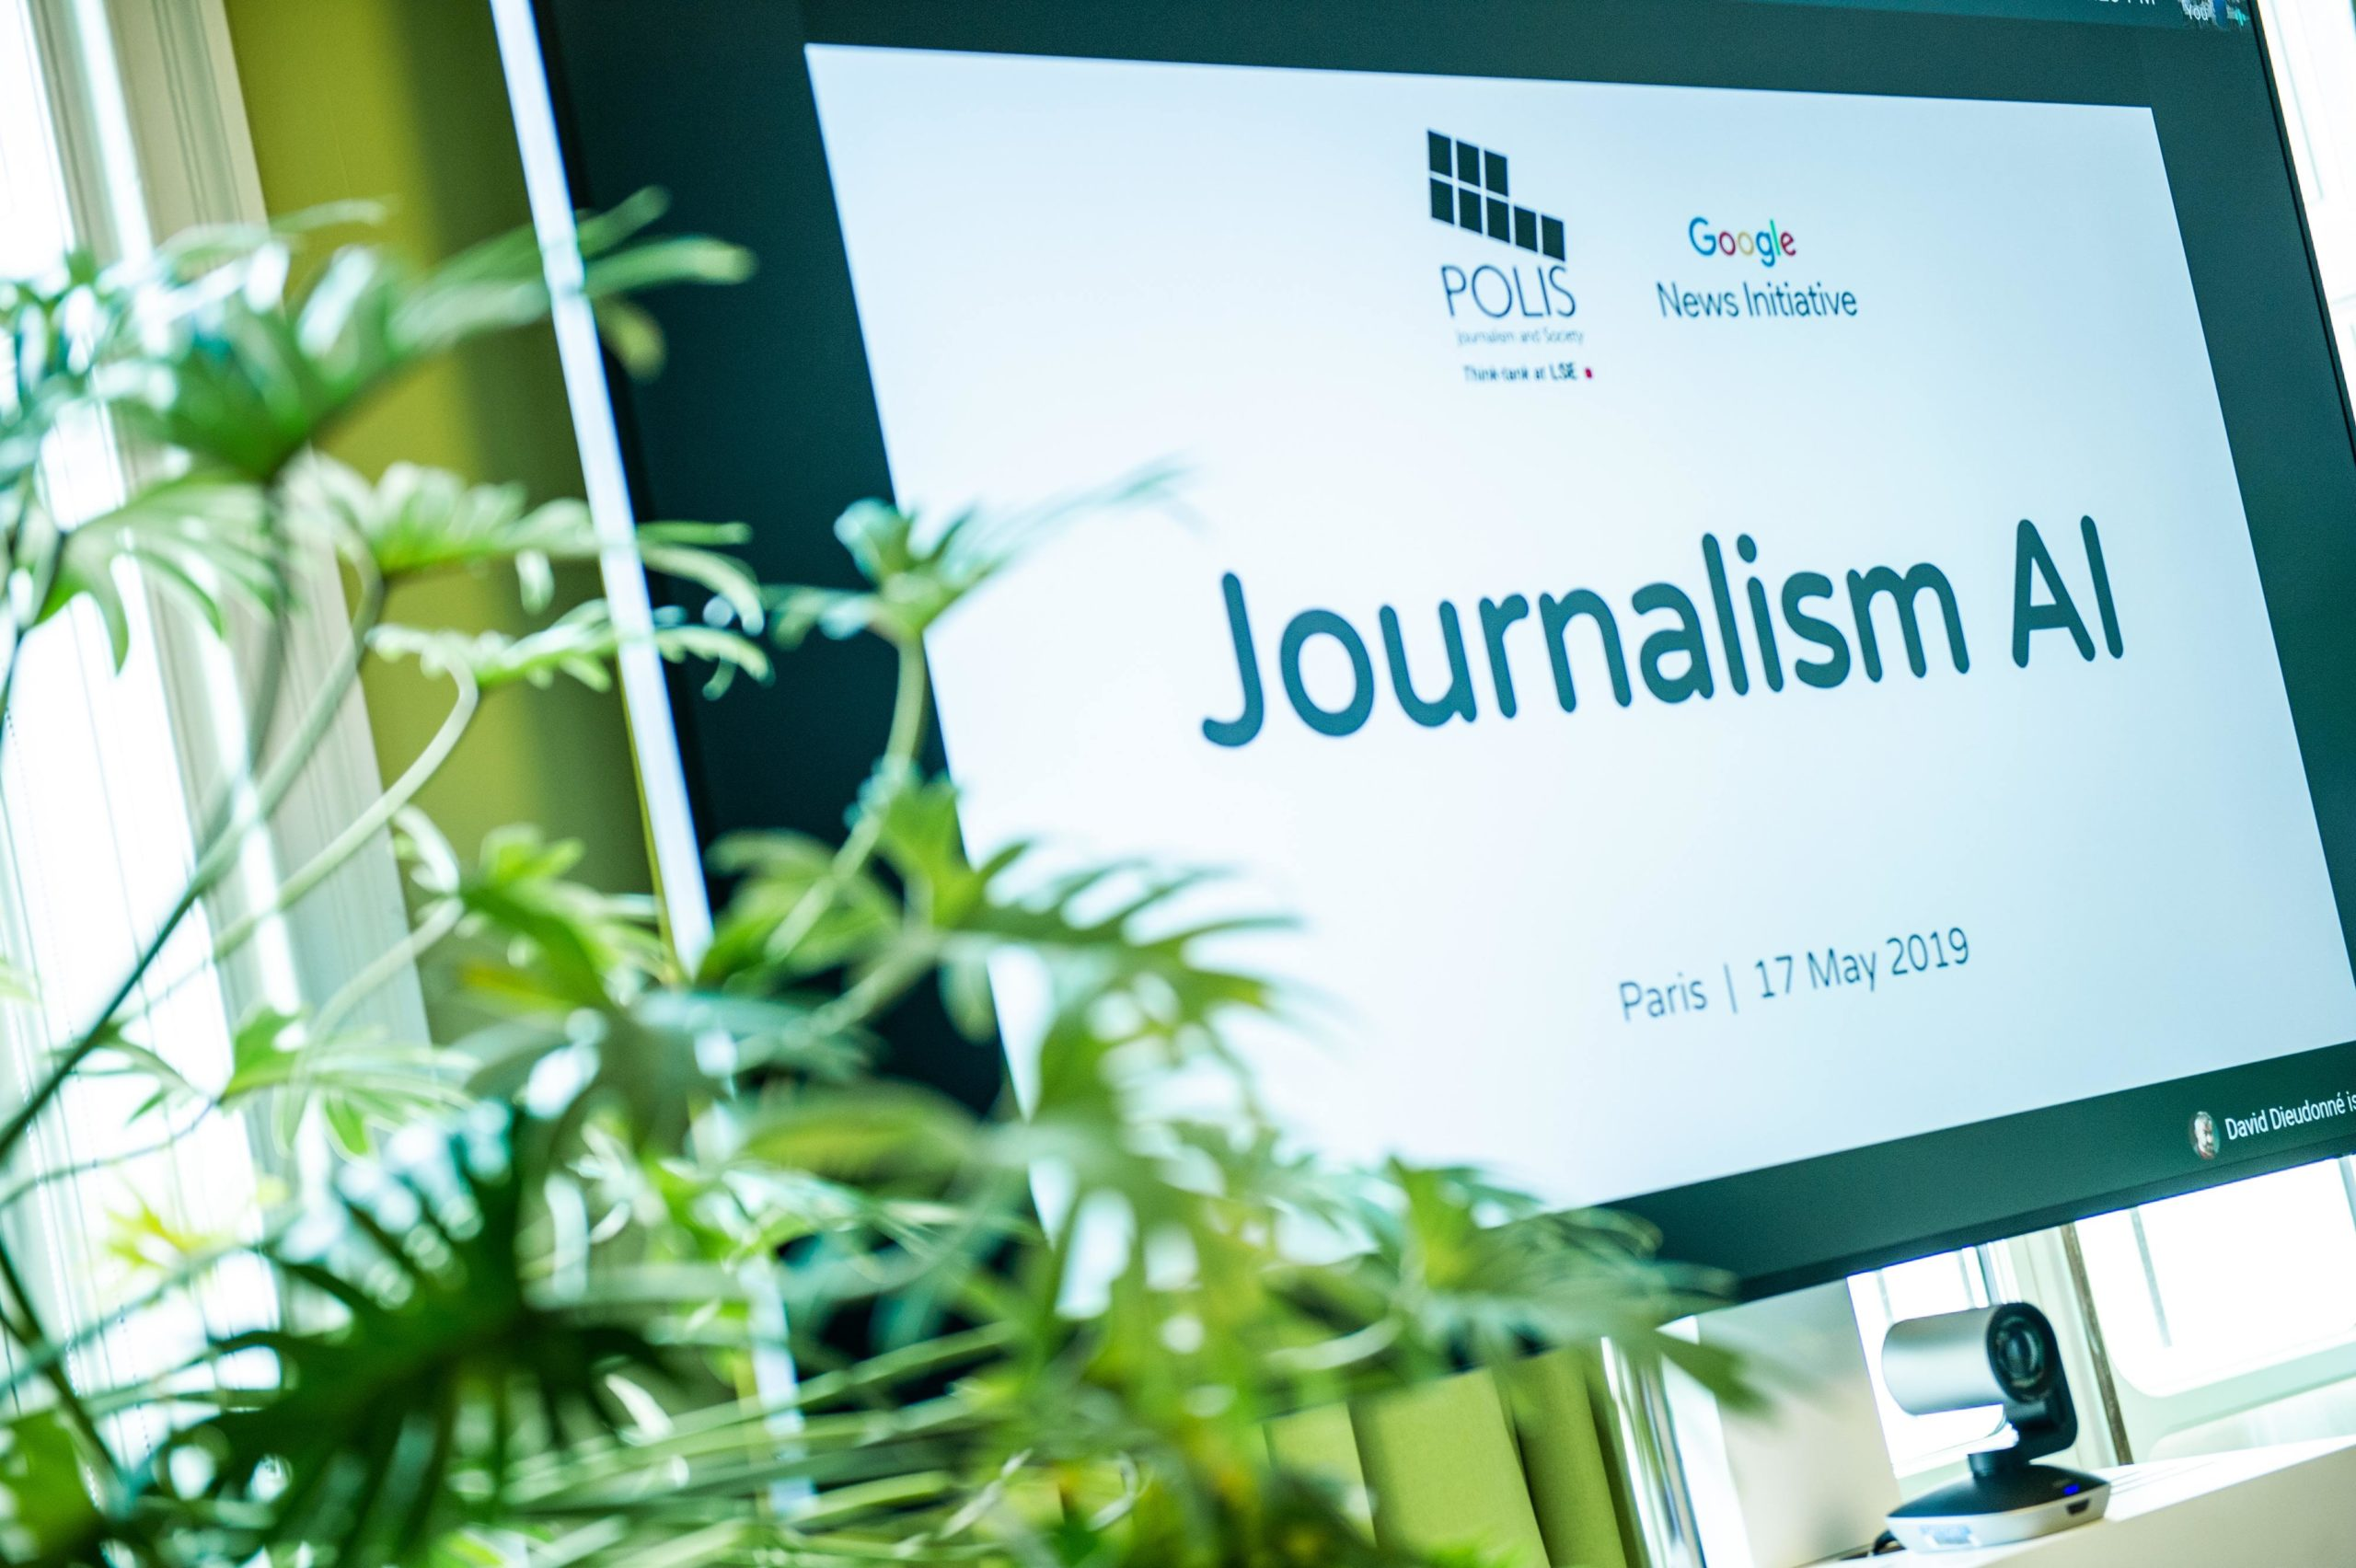 Journalism AI Google